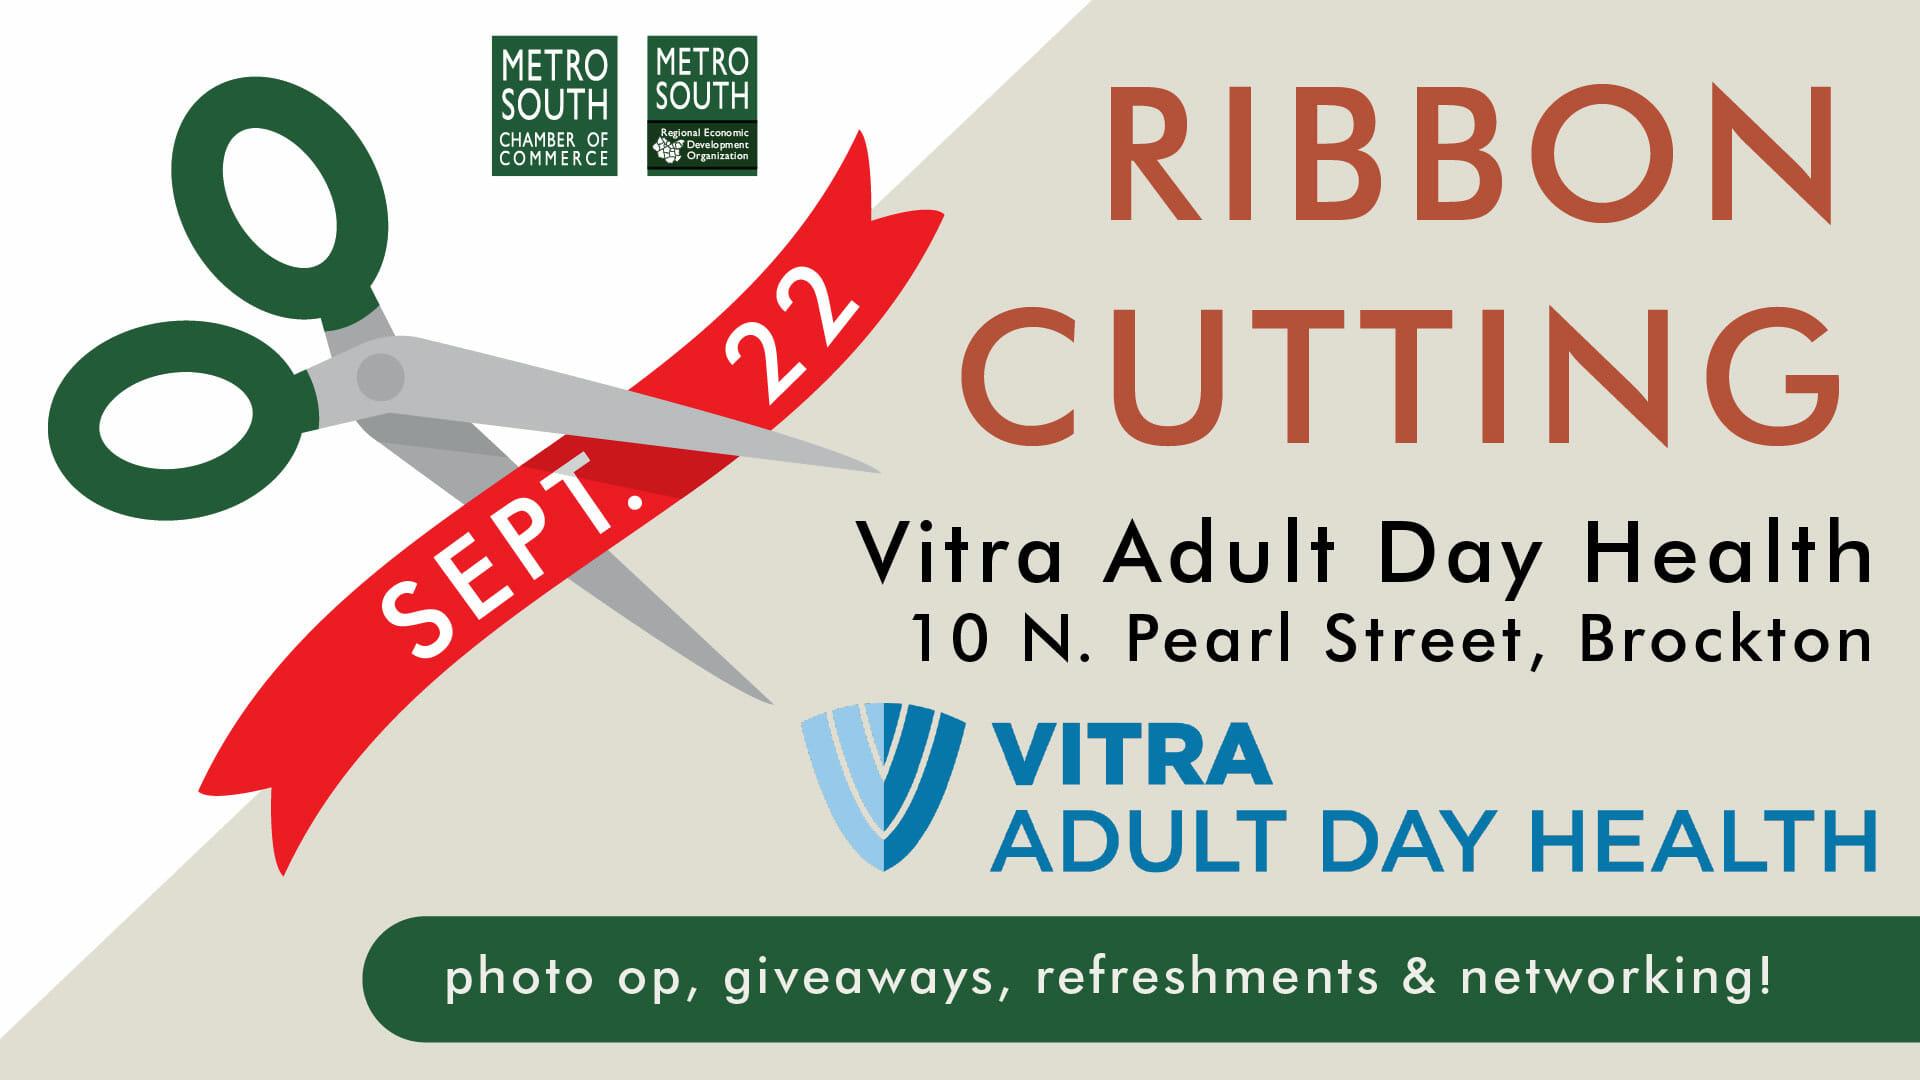 ribbon-cutting-vitra